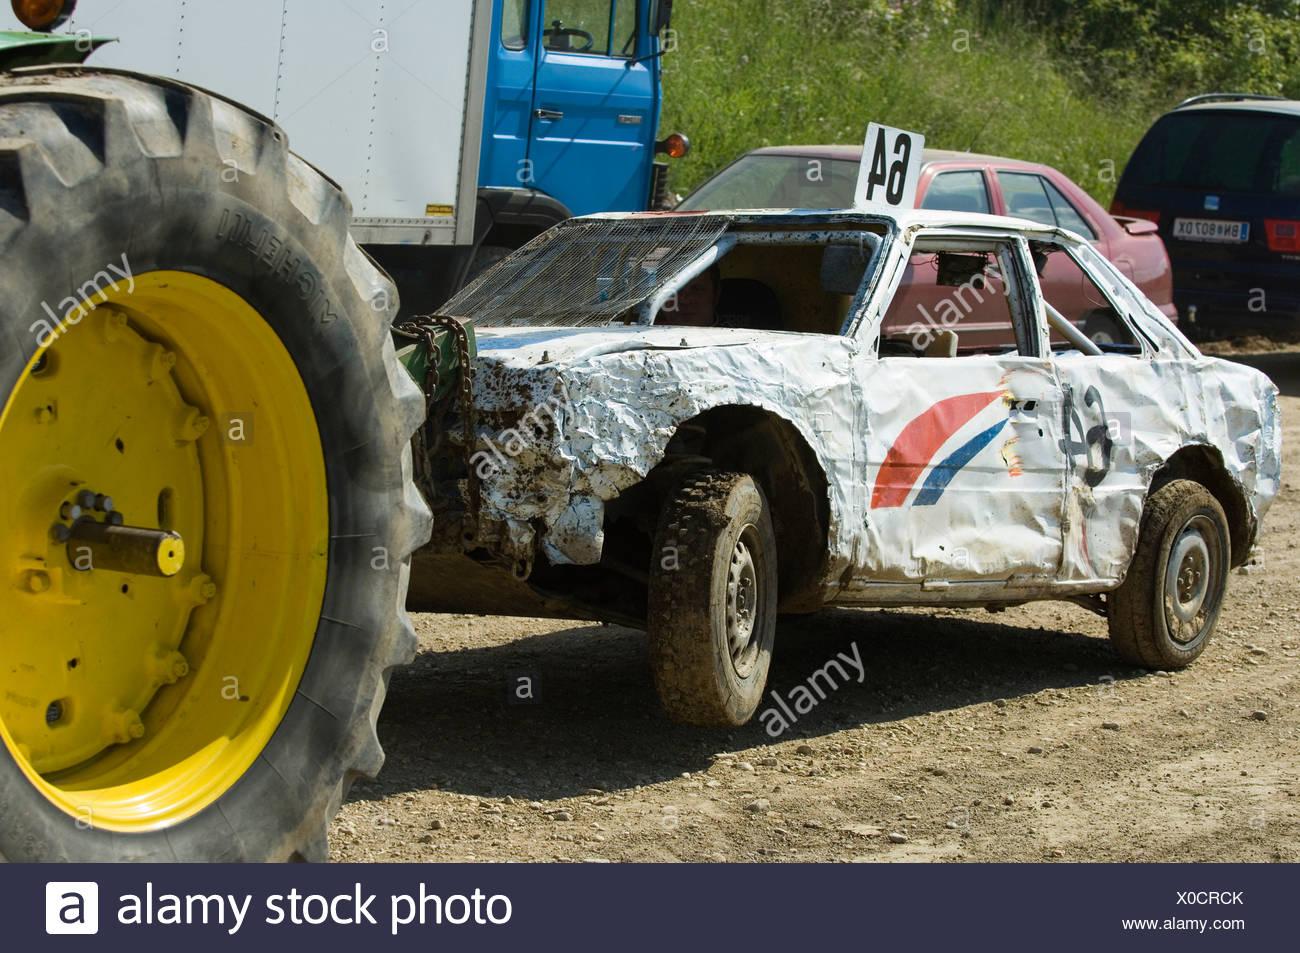 Racing crash stock photos racing crash stock images alamy for Moss motors used cars airport